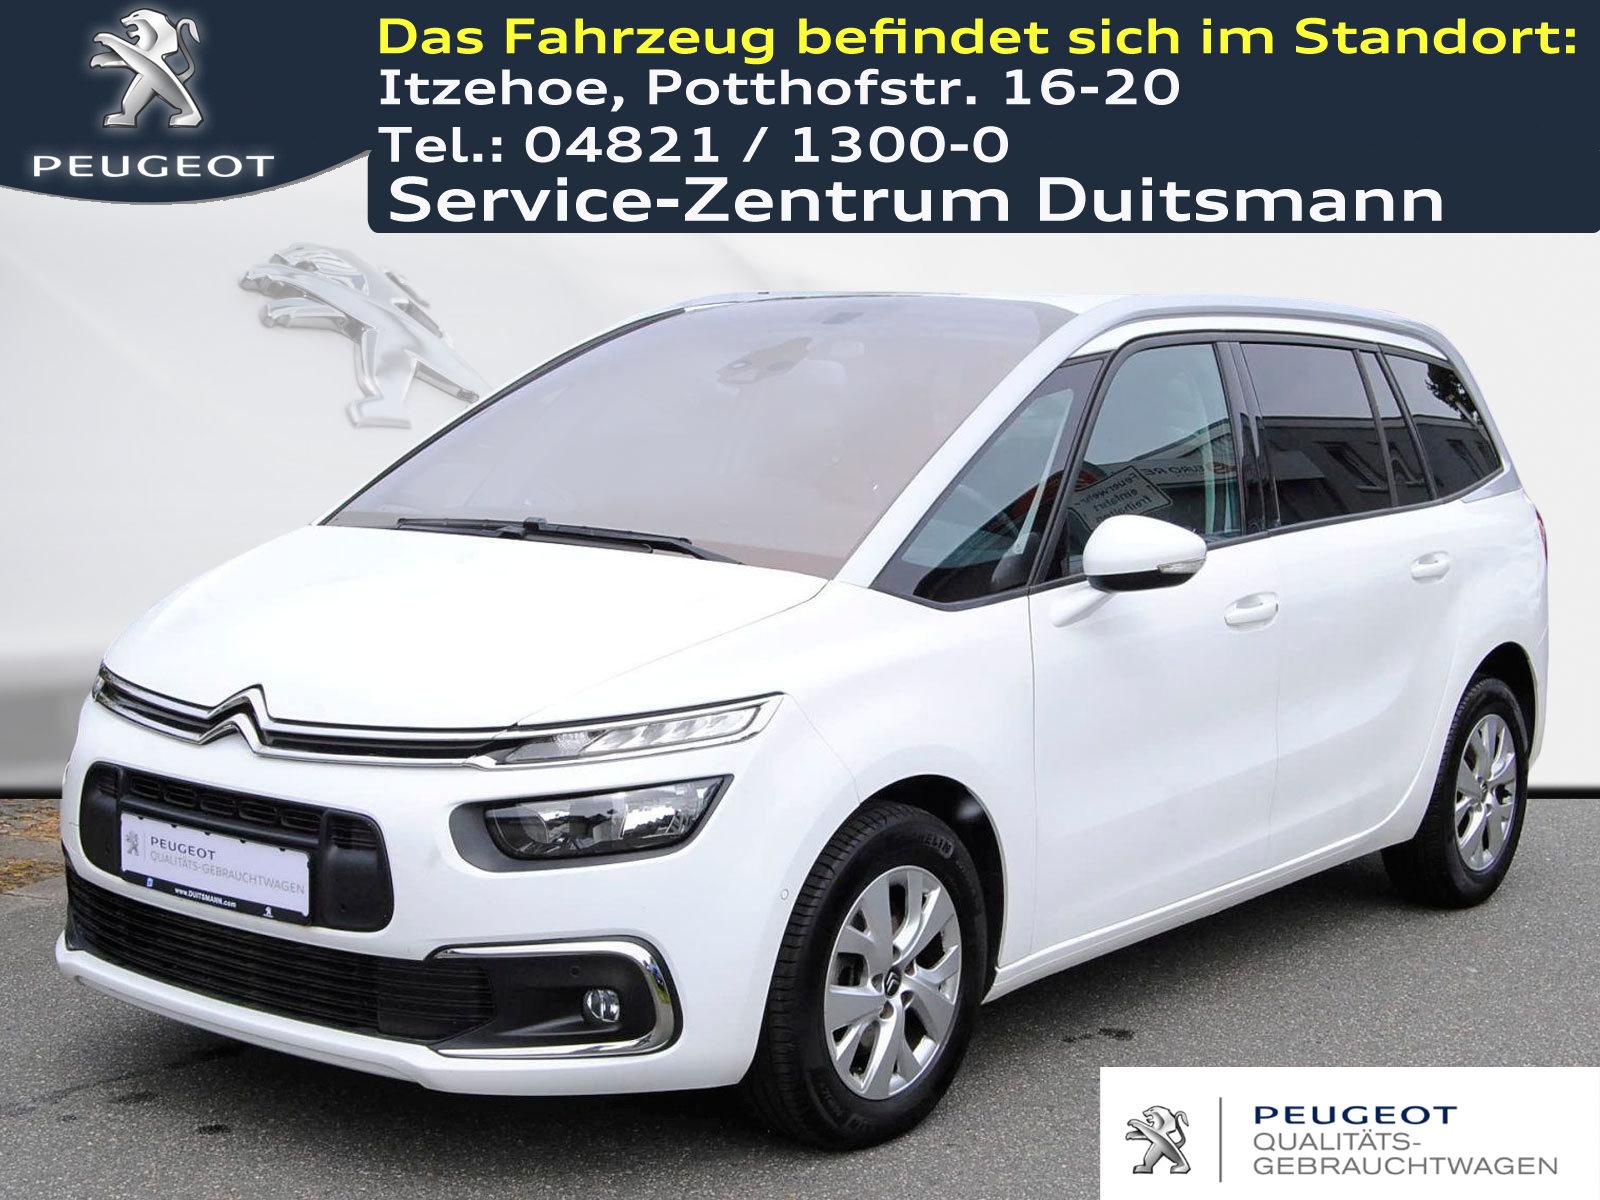 Citroën Grand C4 Picasso THP 165 Stop&Start EAT6 SELECTION, Jahr 2018, Benzin